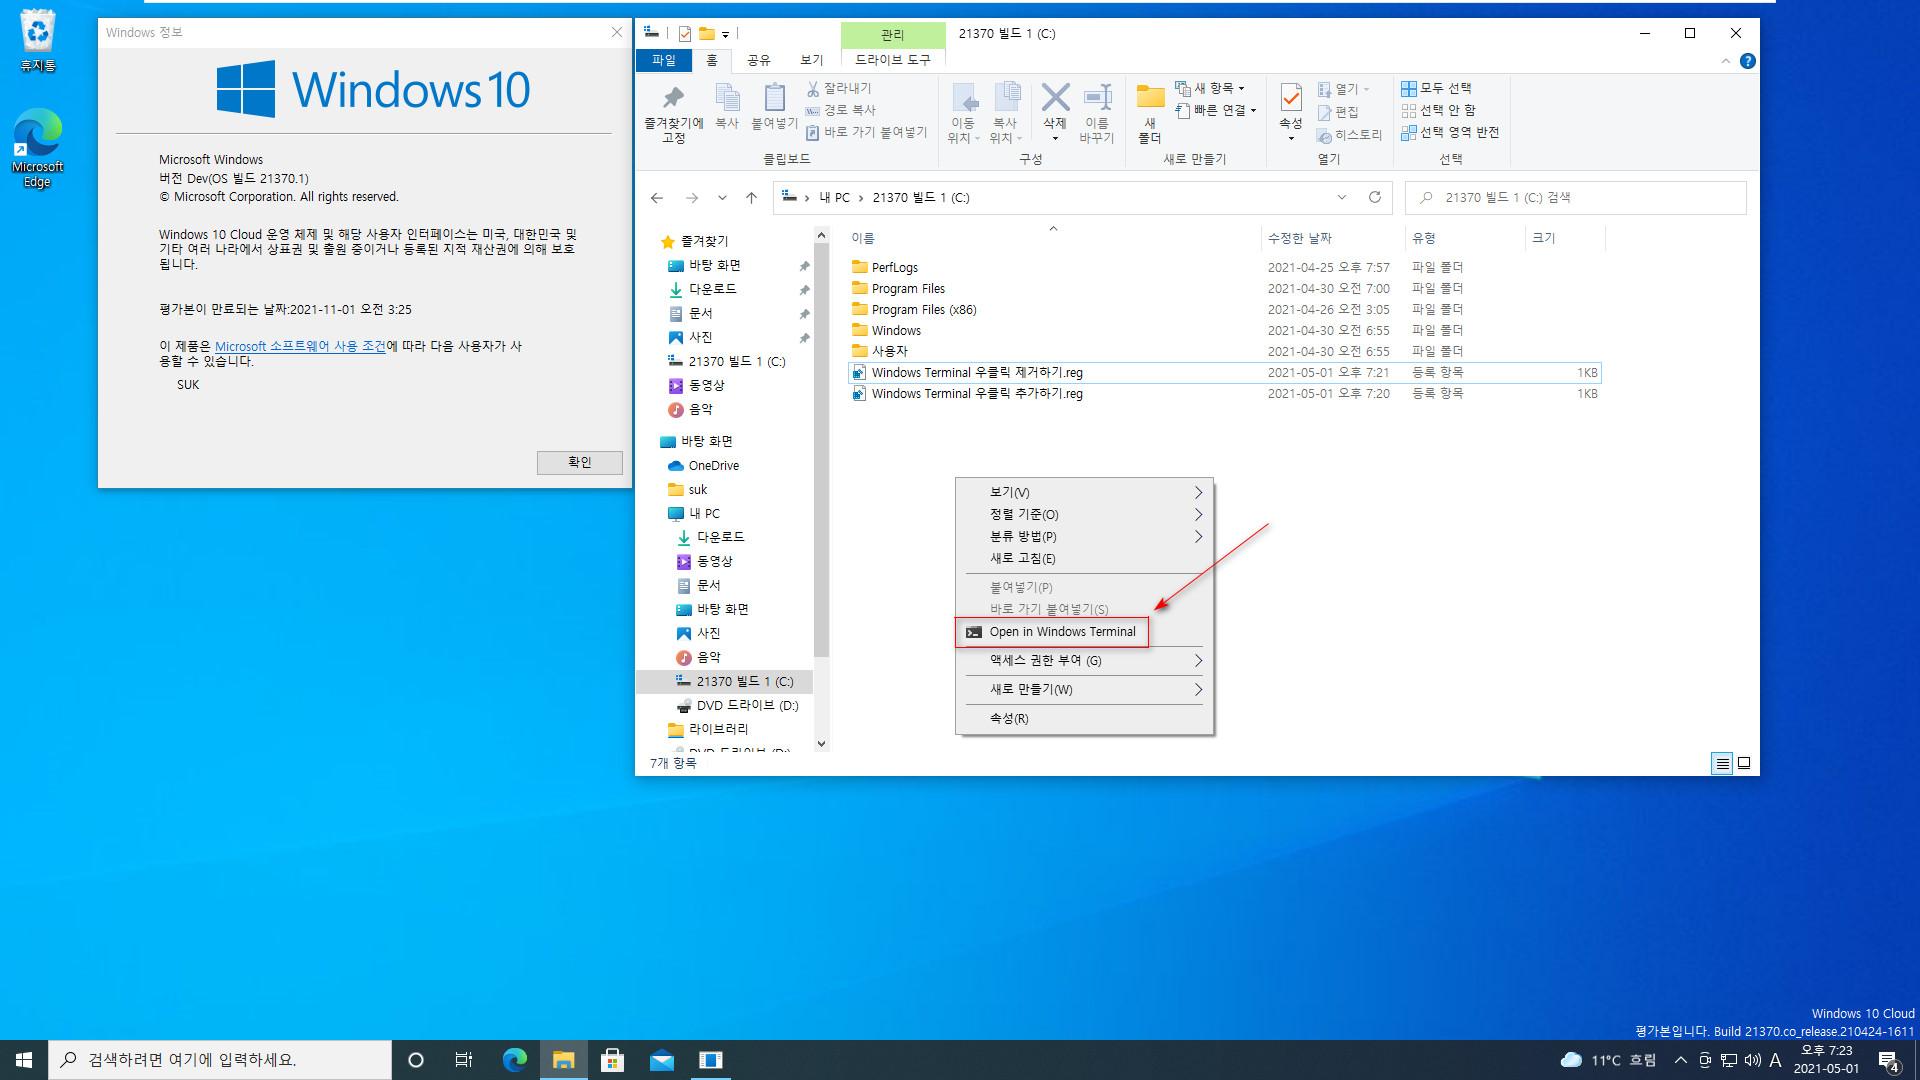 Windows Terminal 우클릭 제거하기.reg와 Windows Terminal 우클릭 추가하기.reg 테스트 2021-05-01_192332.jpg